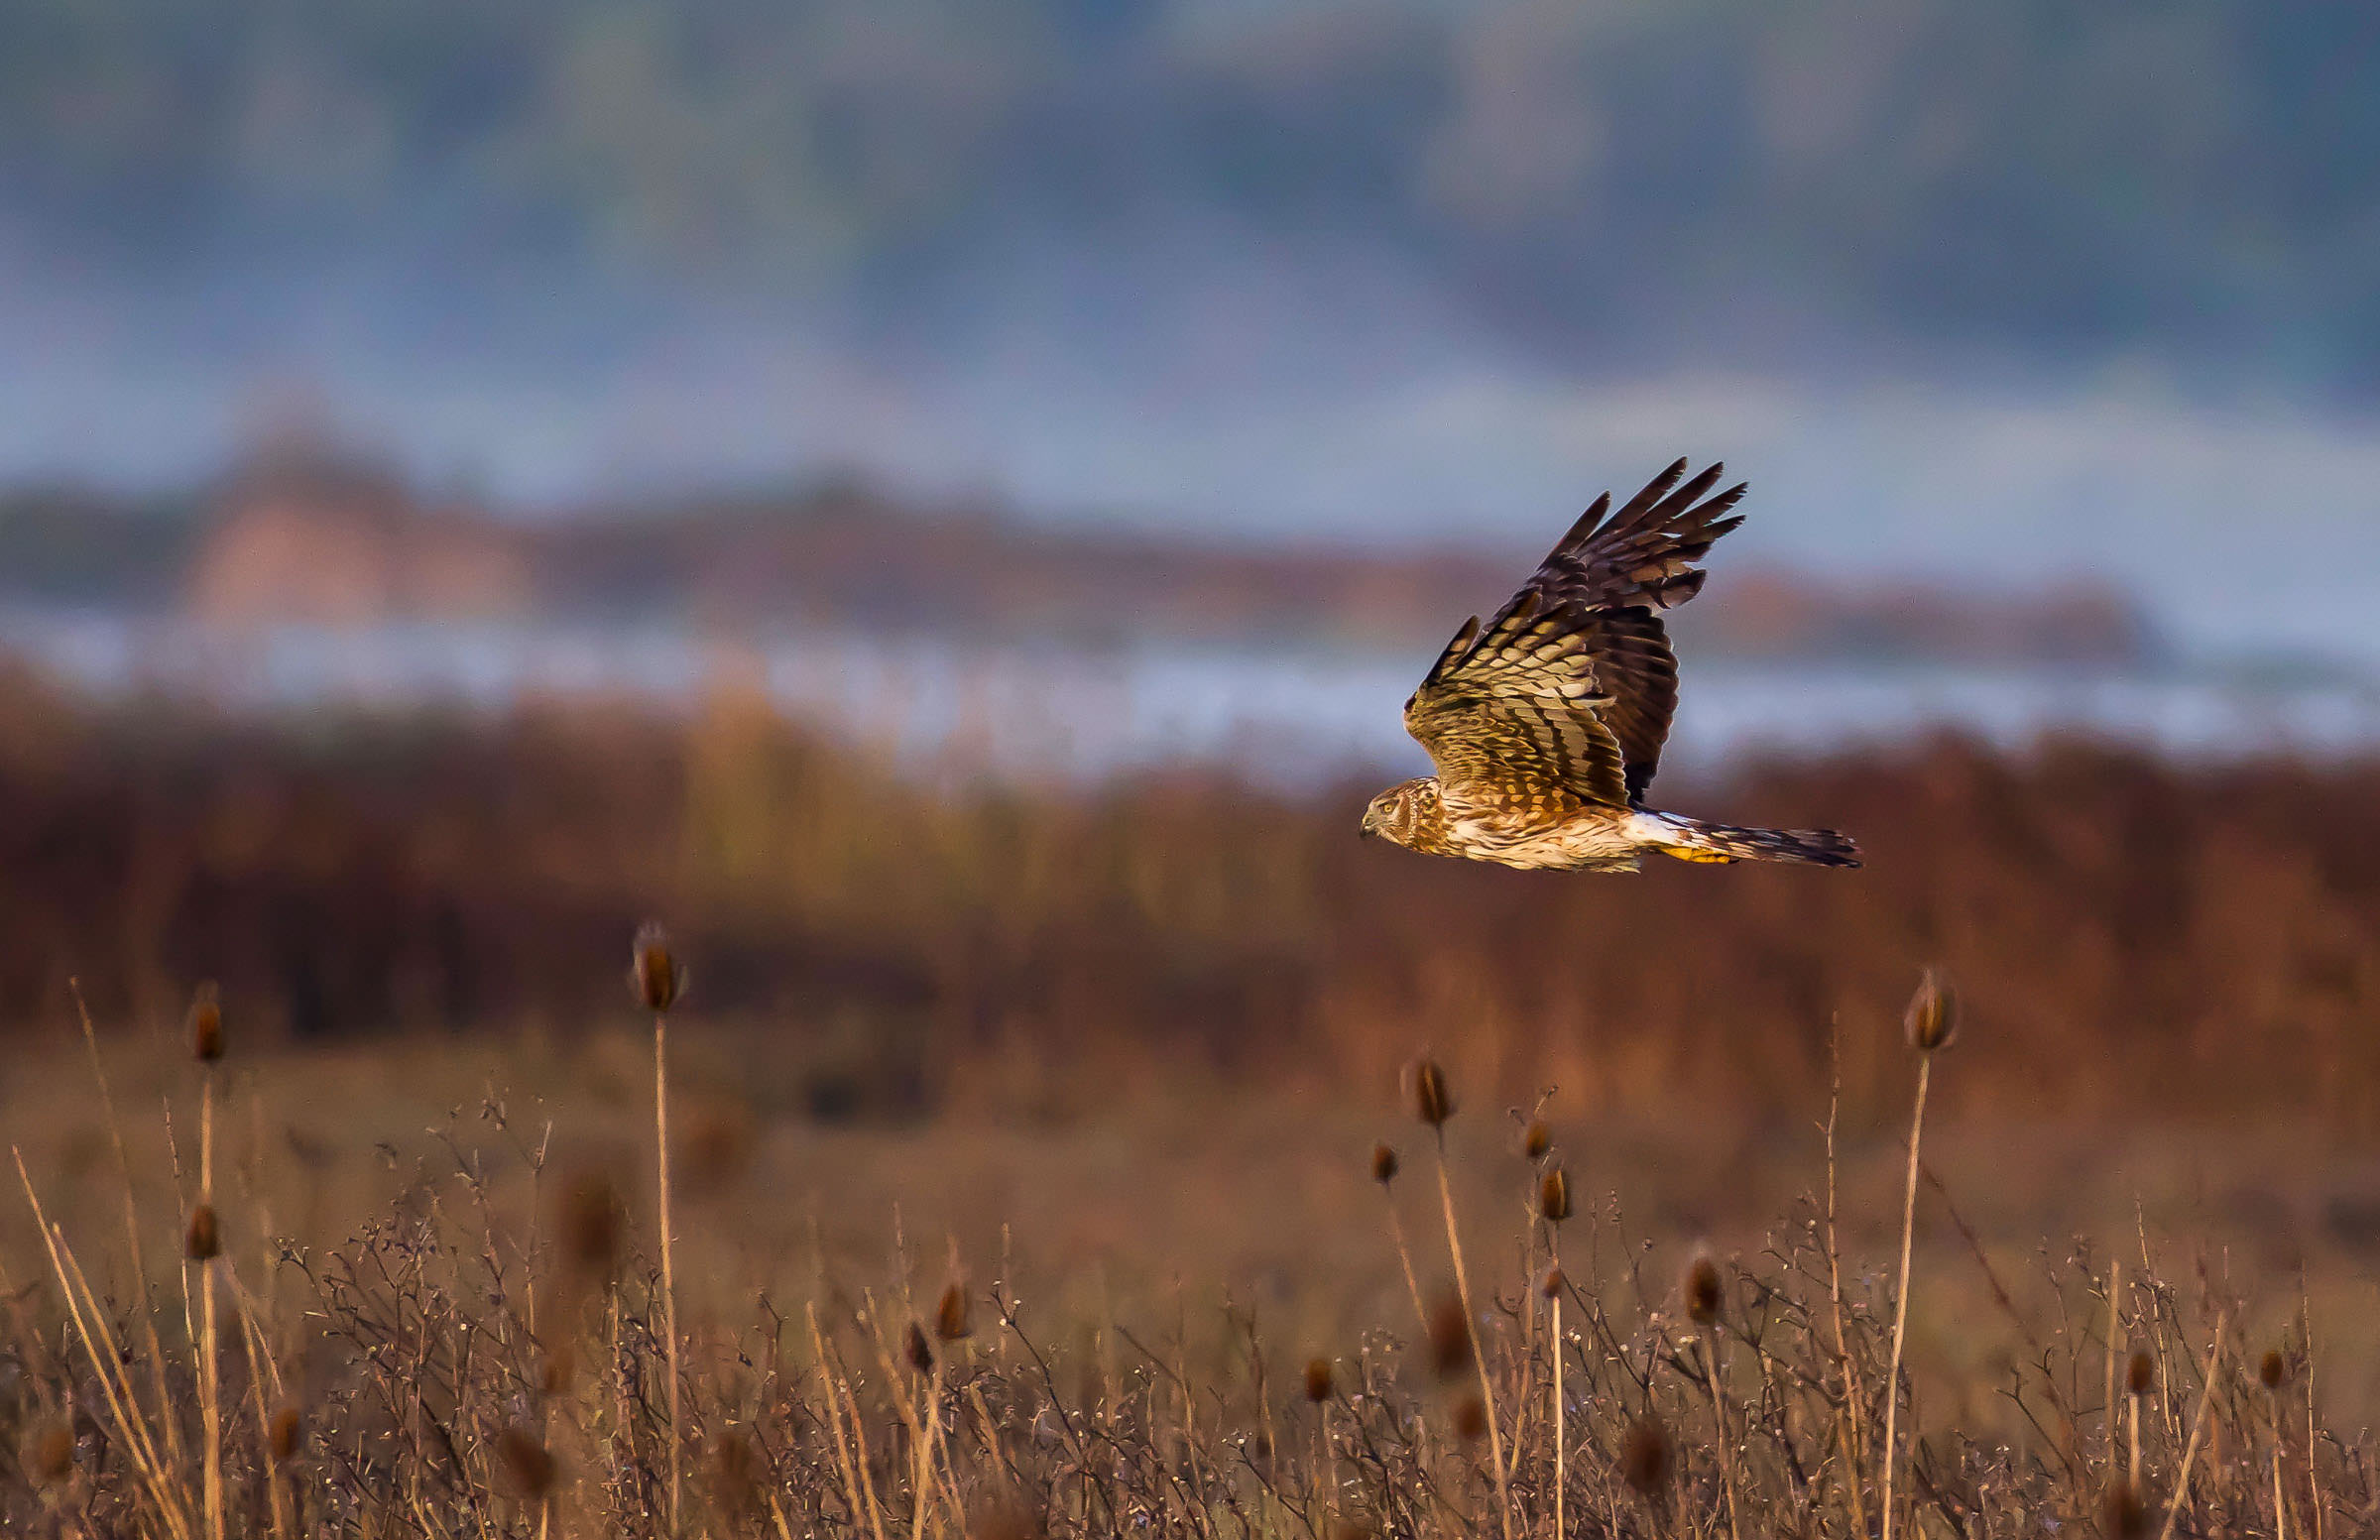 northern_harrier_hunting_jackrabbit-1.jpg